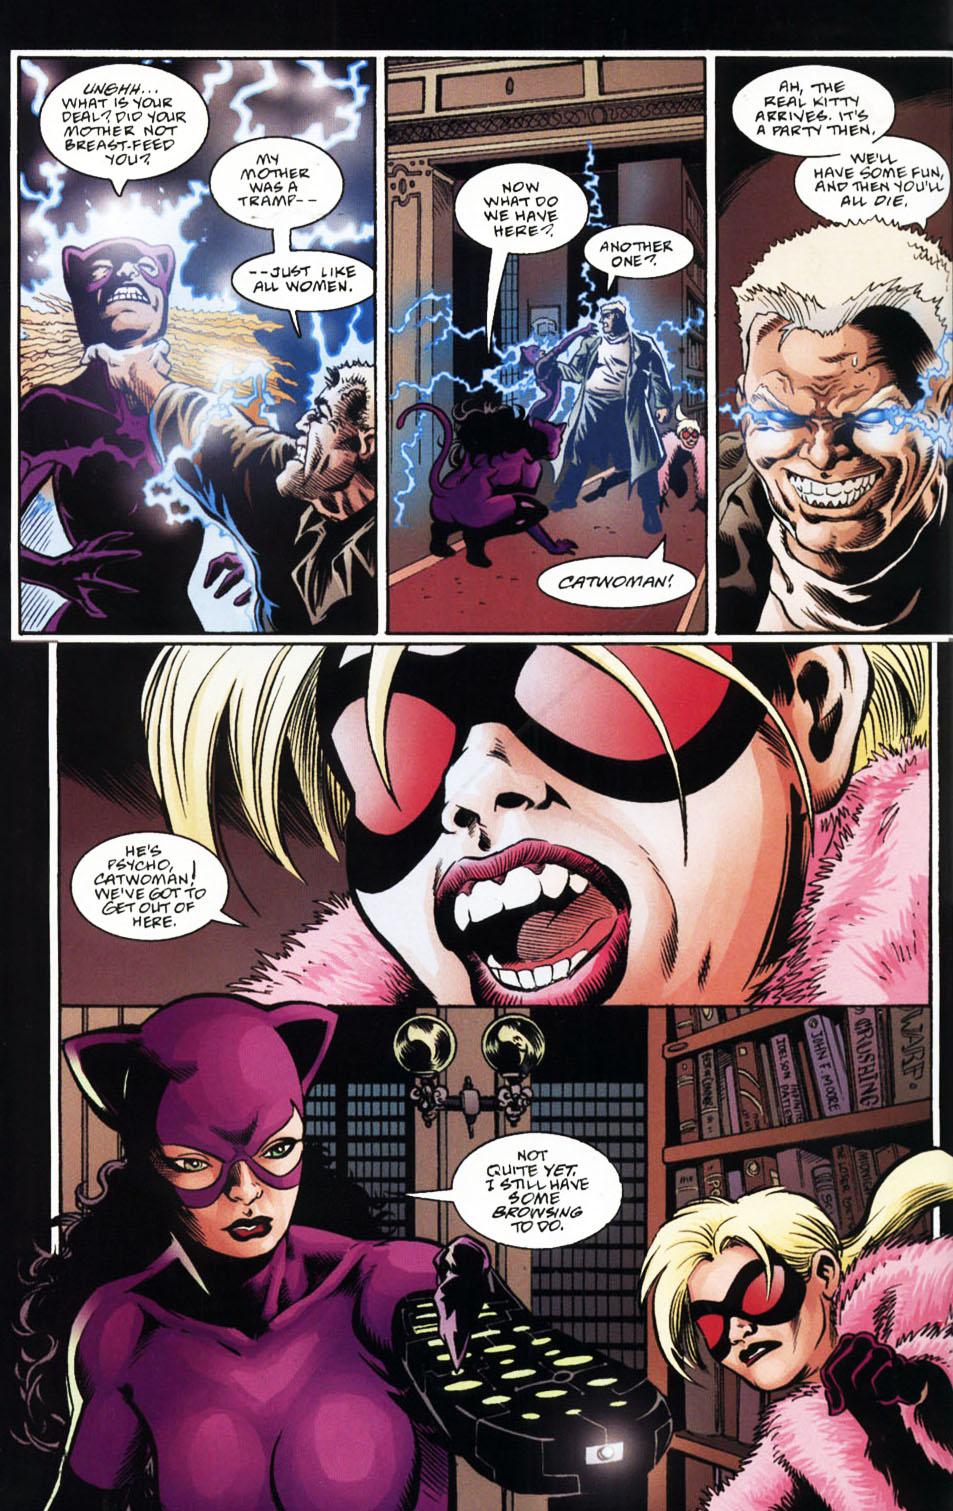 Birds Of Prey - Batgirl-Catwoman 1-44 RyderBurnham ValLewton.jpg